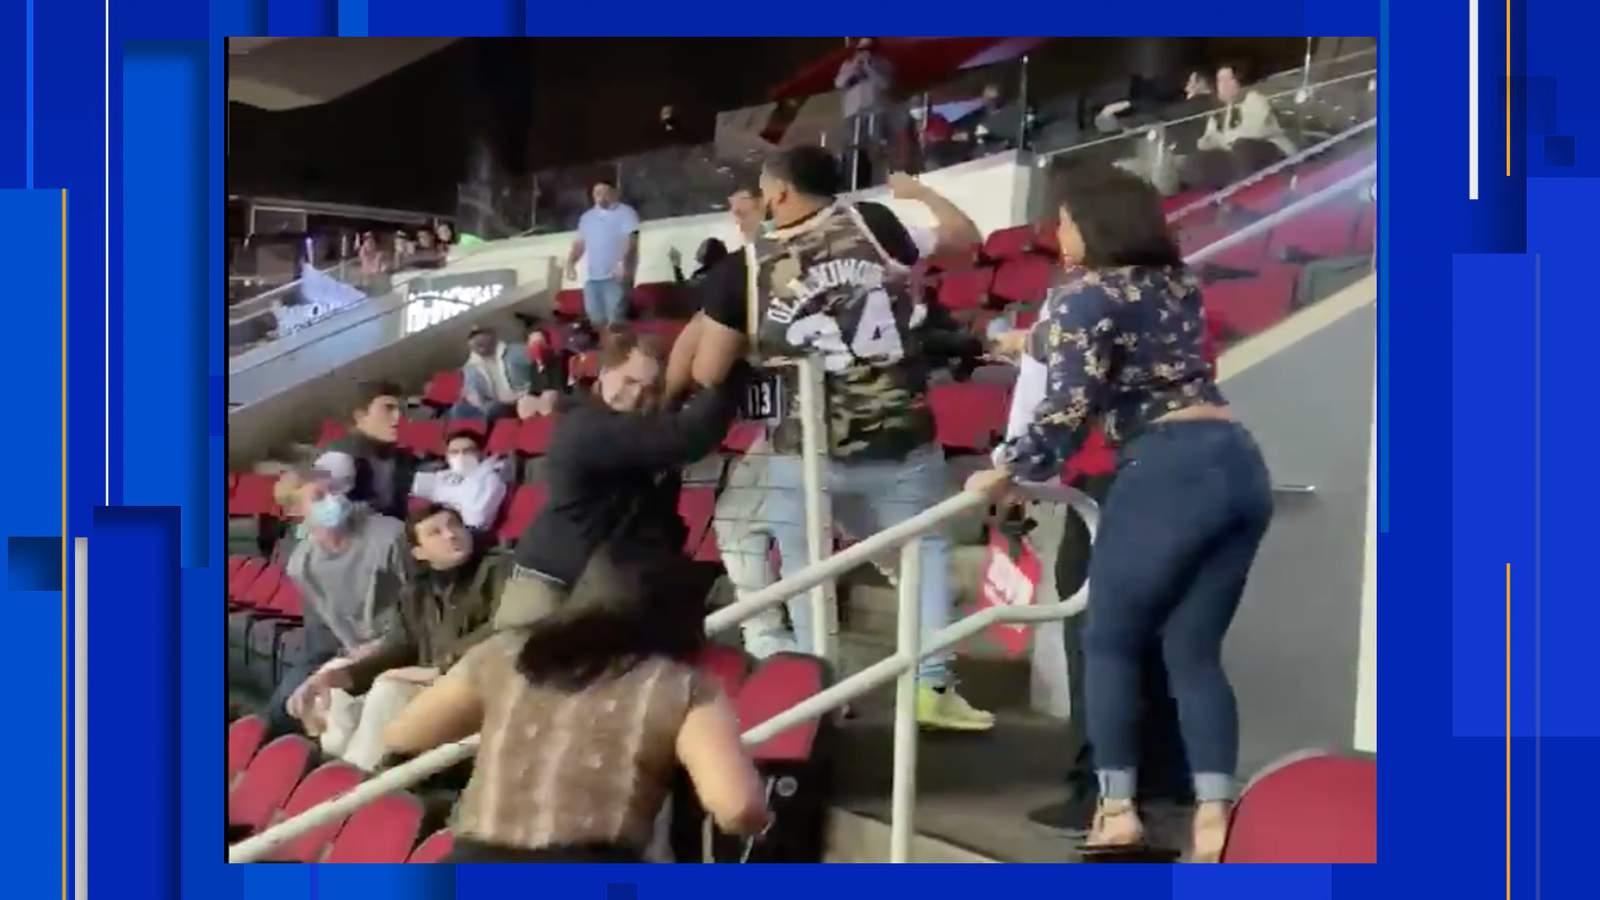 Social media video shows brawl between Spurs, Rockets fans in Houston - KSAT San Antonio